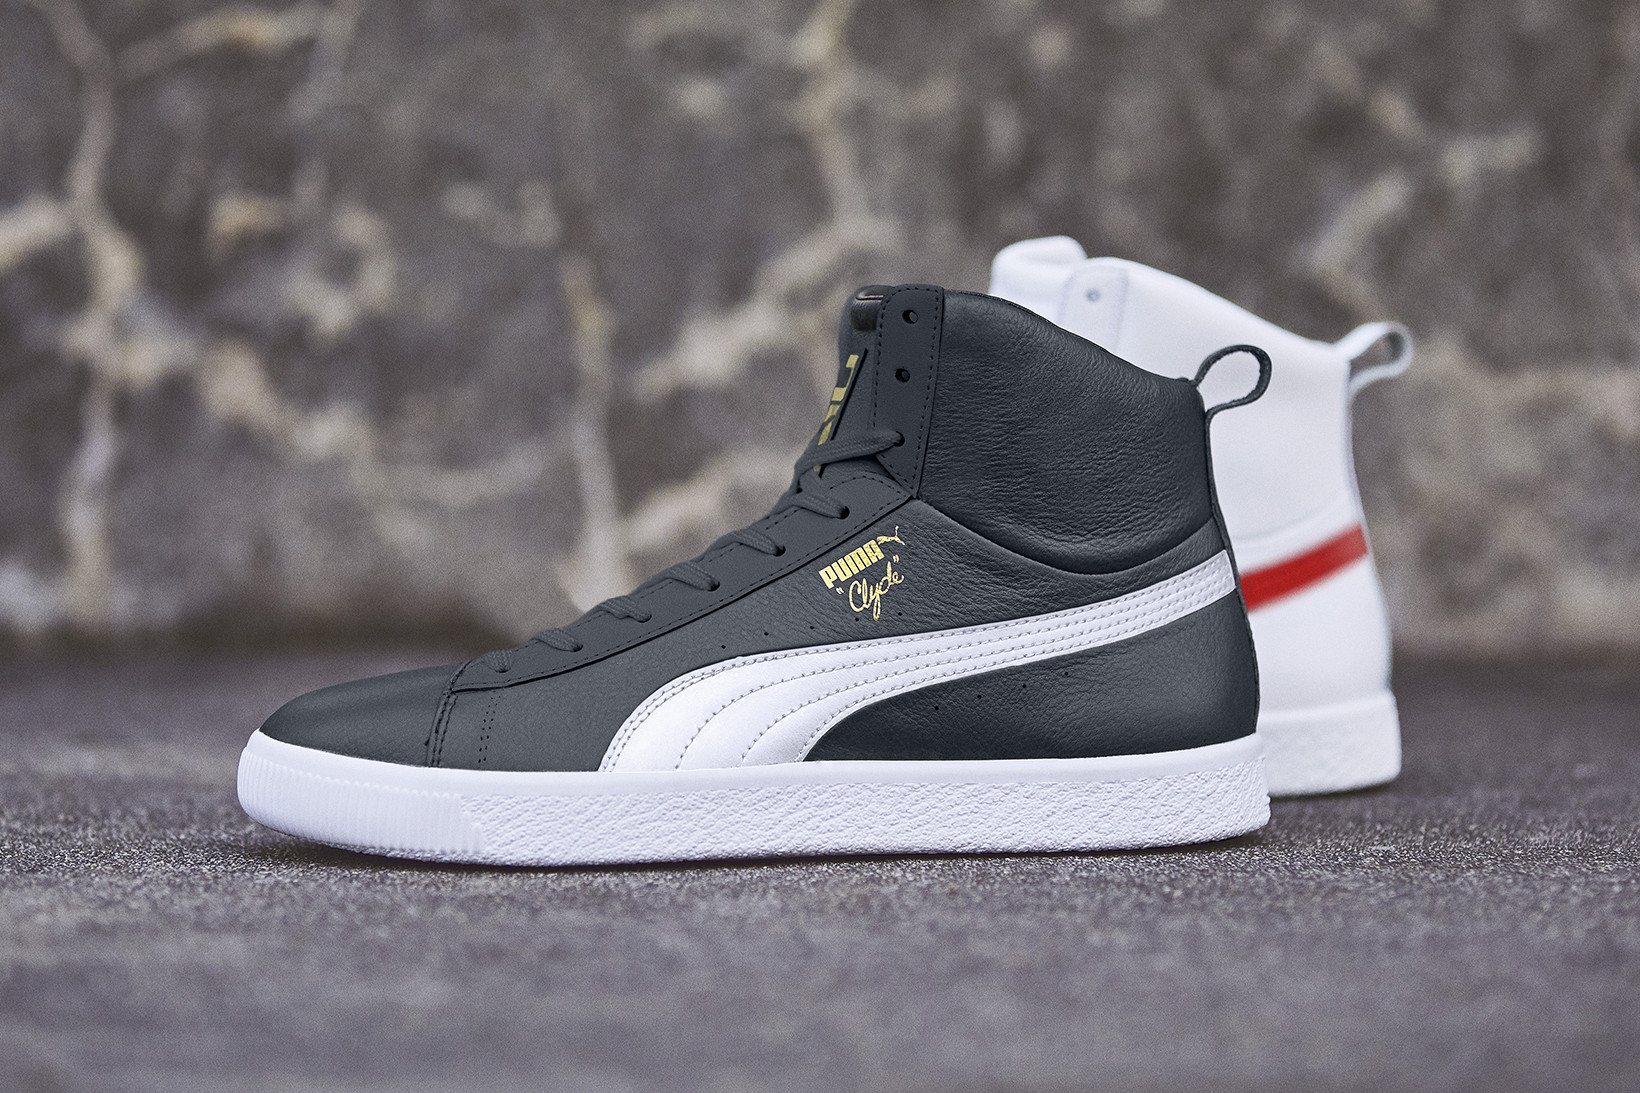 PUMA Unveils the Clyde Mid Foil Sneaker